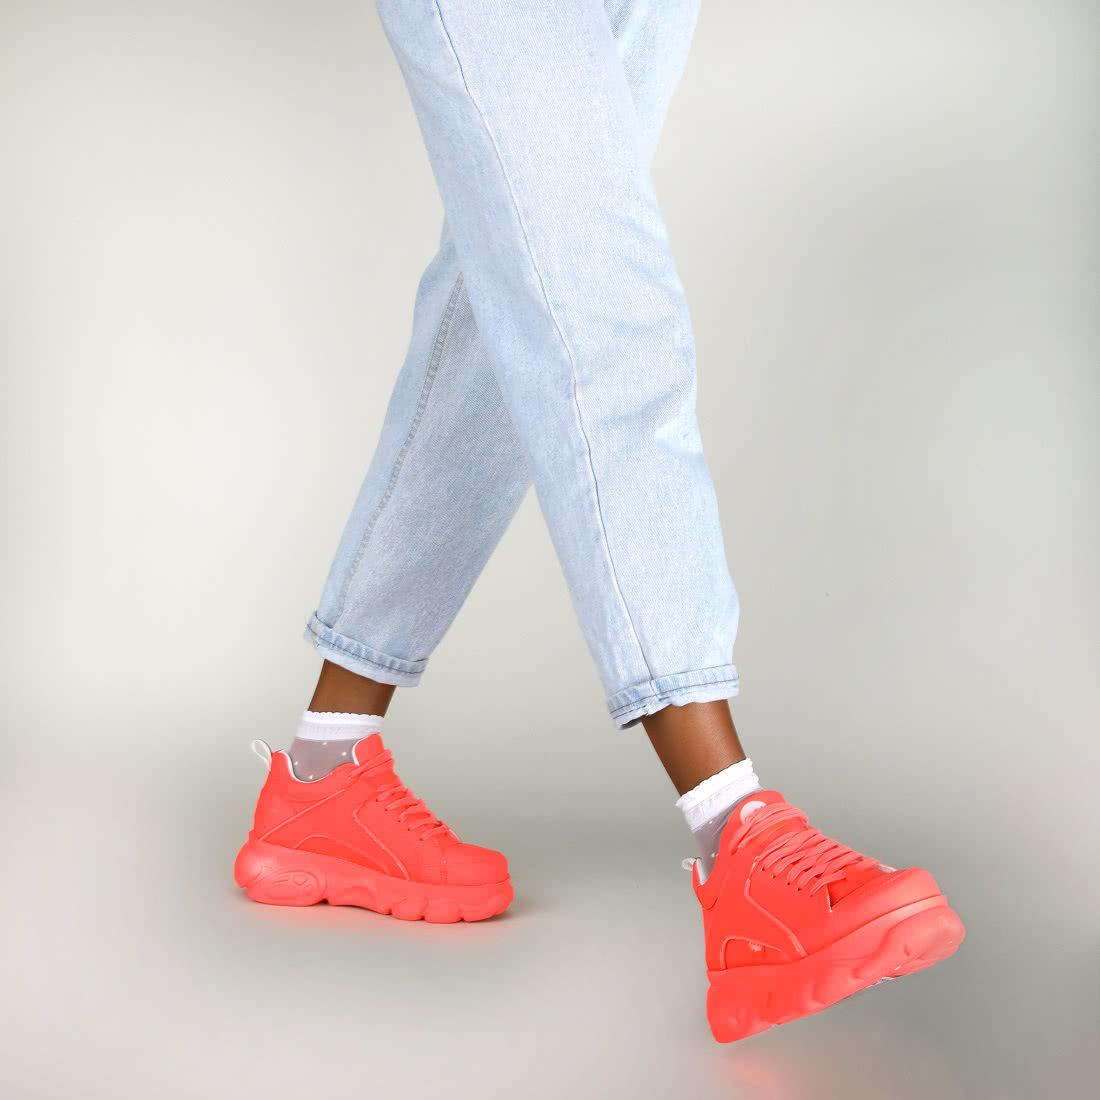 Orange Sneaker Neon Cld Corin Sneaker Corin Cld Neon Orange CdxWeoBEQr